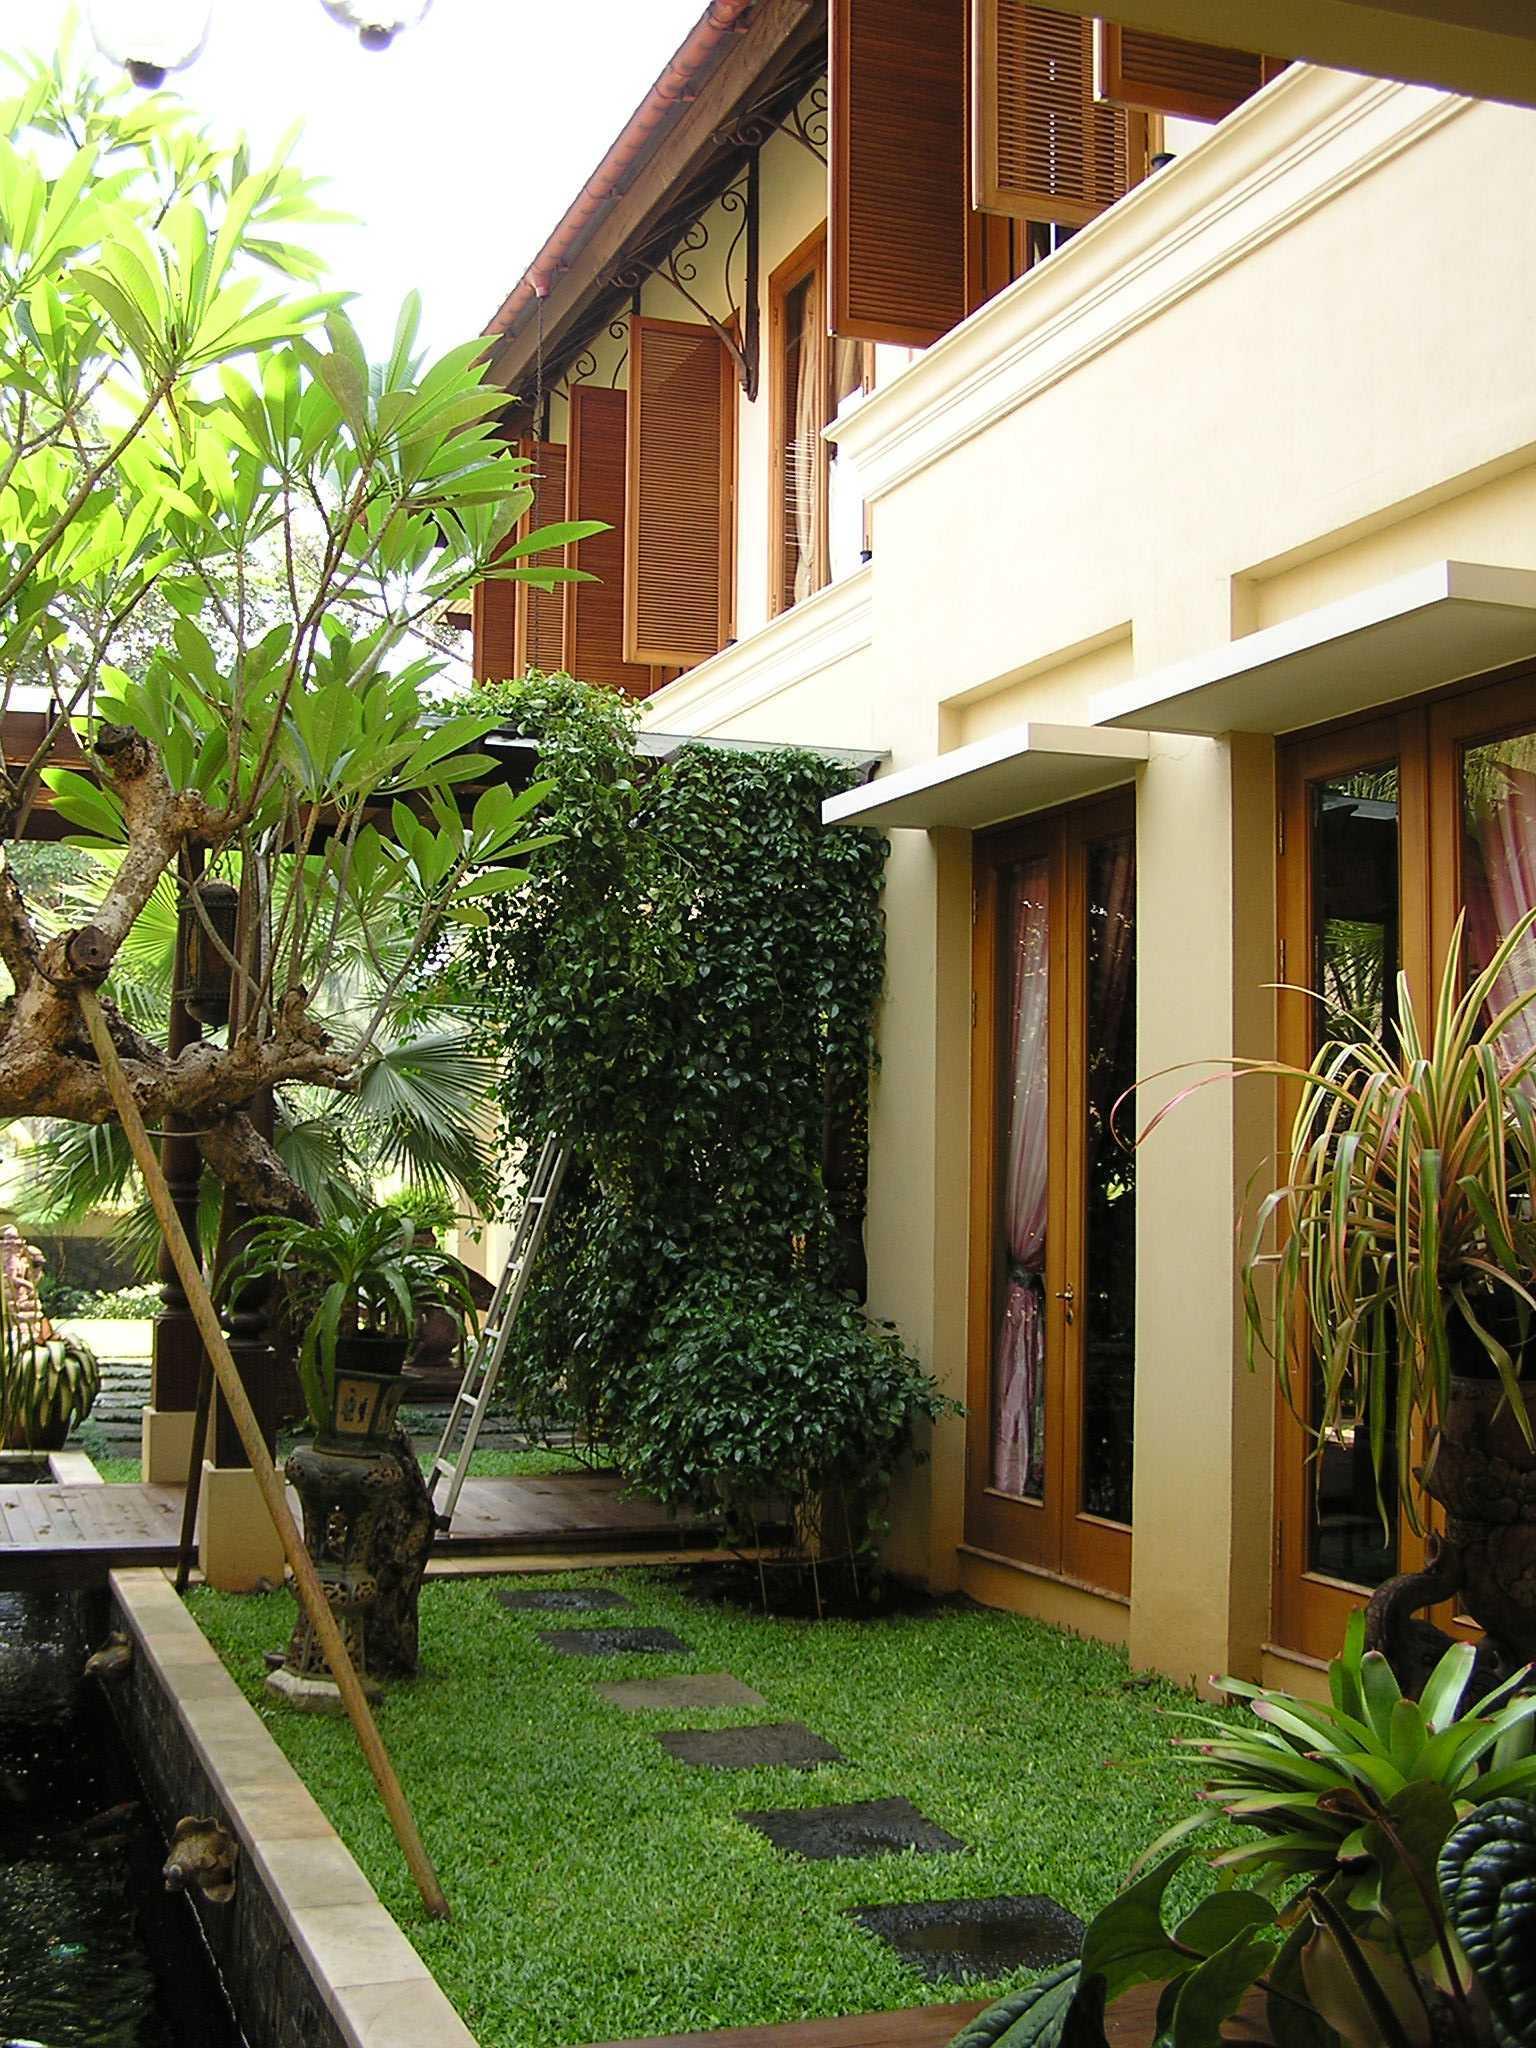 Pt. Garisprada Metro Kencana Residence Pondok Pinang, Kebayoran Lama, South Jakarta City, Jakarta, Indonesia Pondok Indah Exterior Tropis  22259